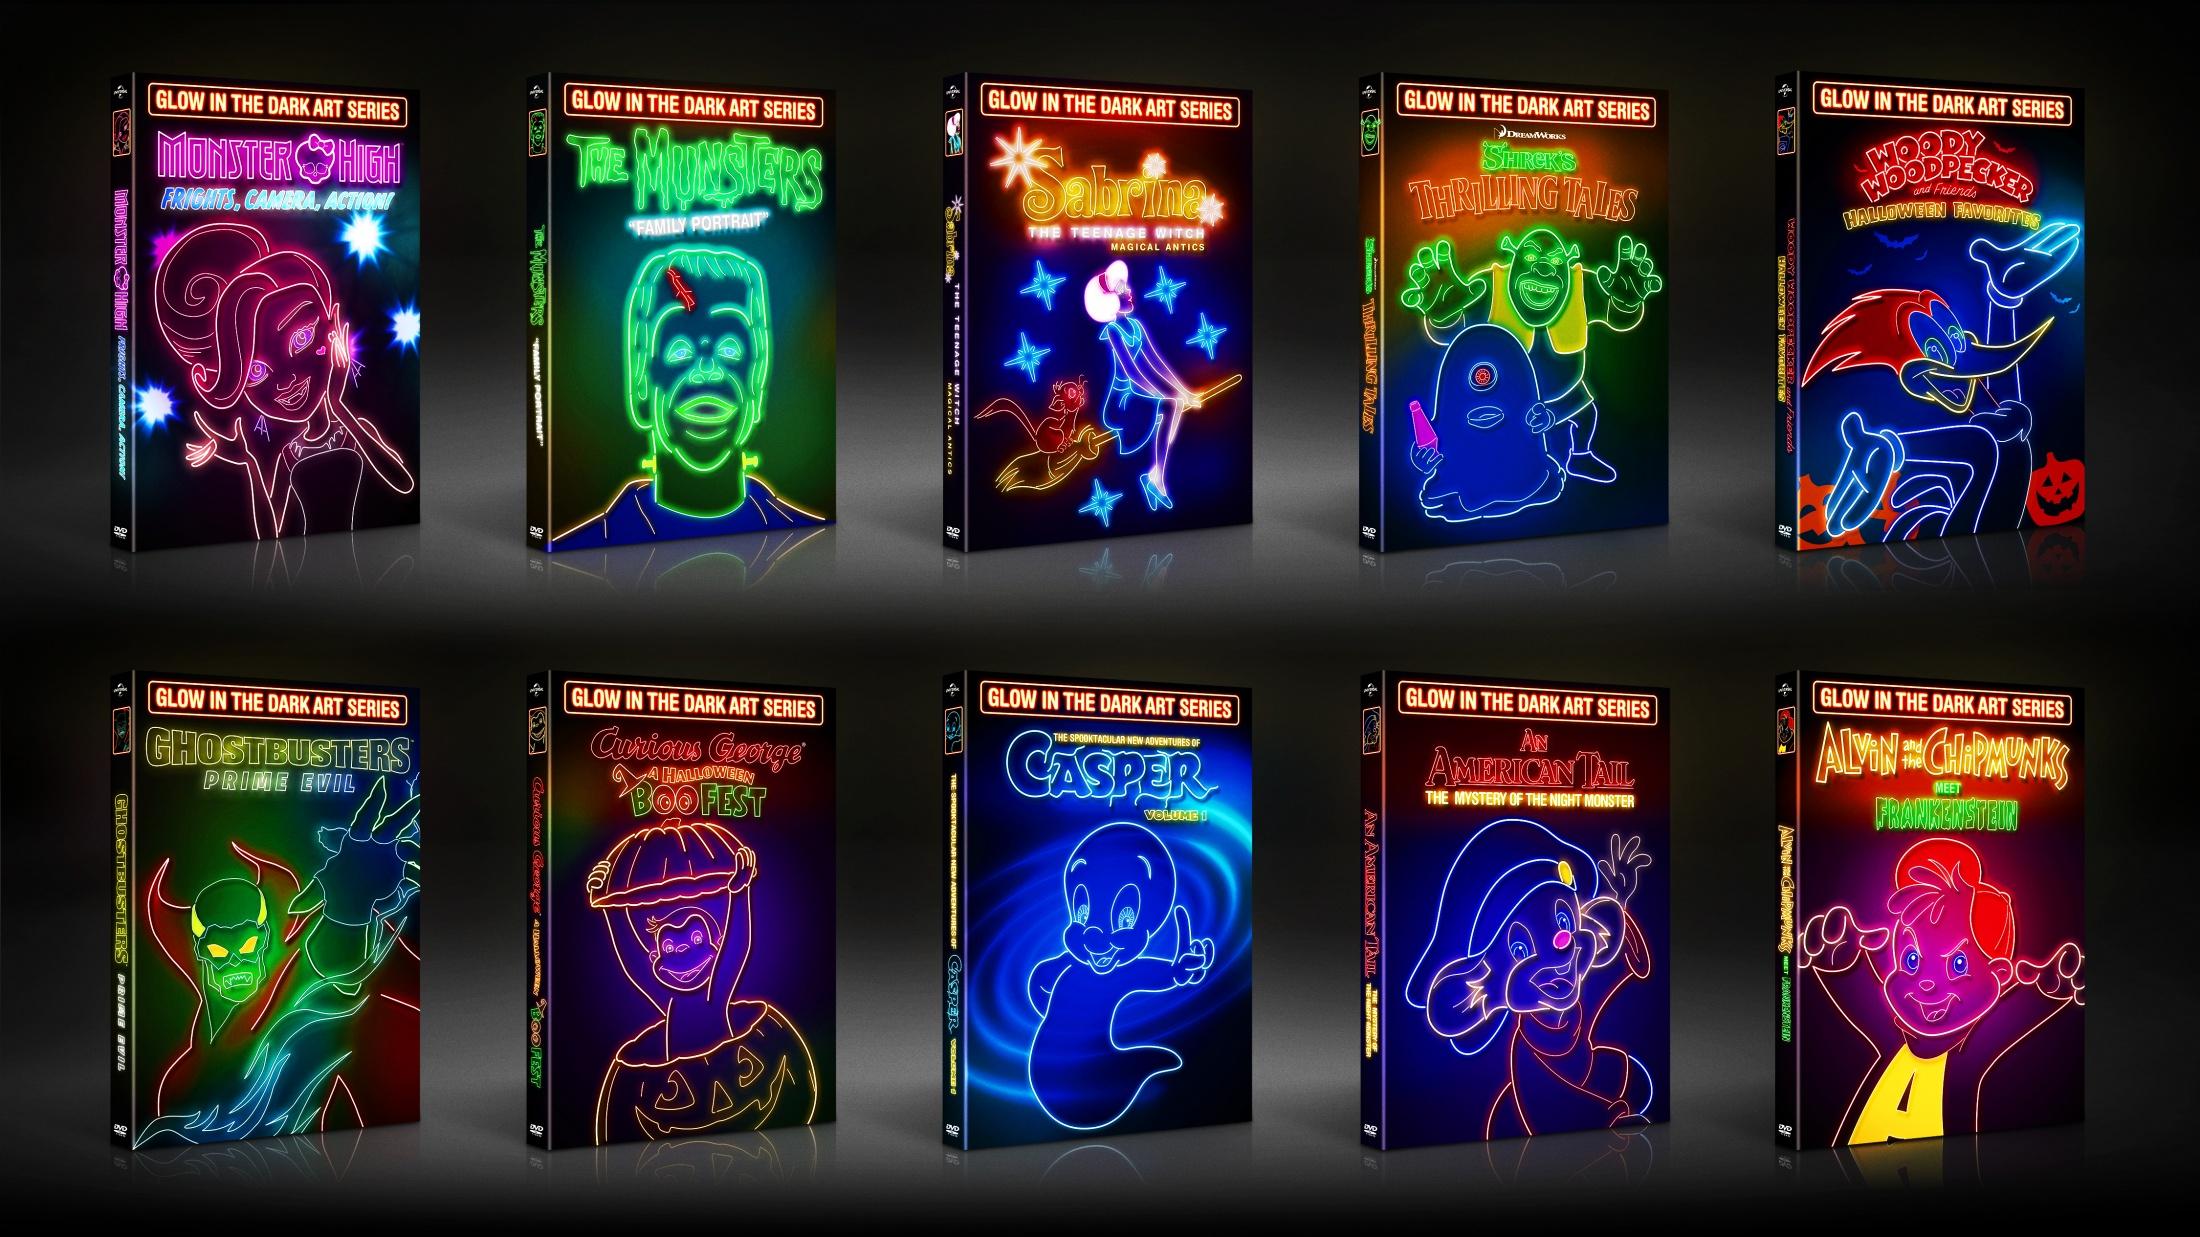 Thumbnail for Glow in the Dark Art Packaging Series